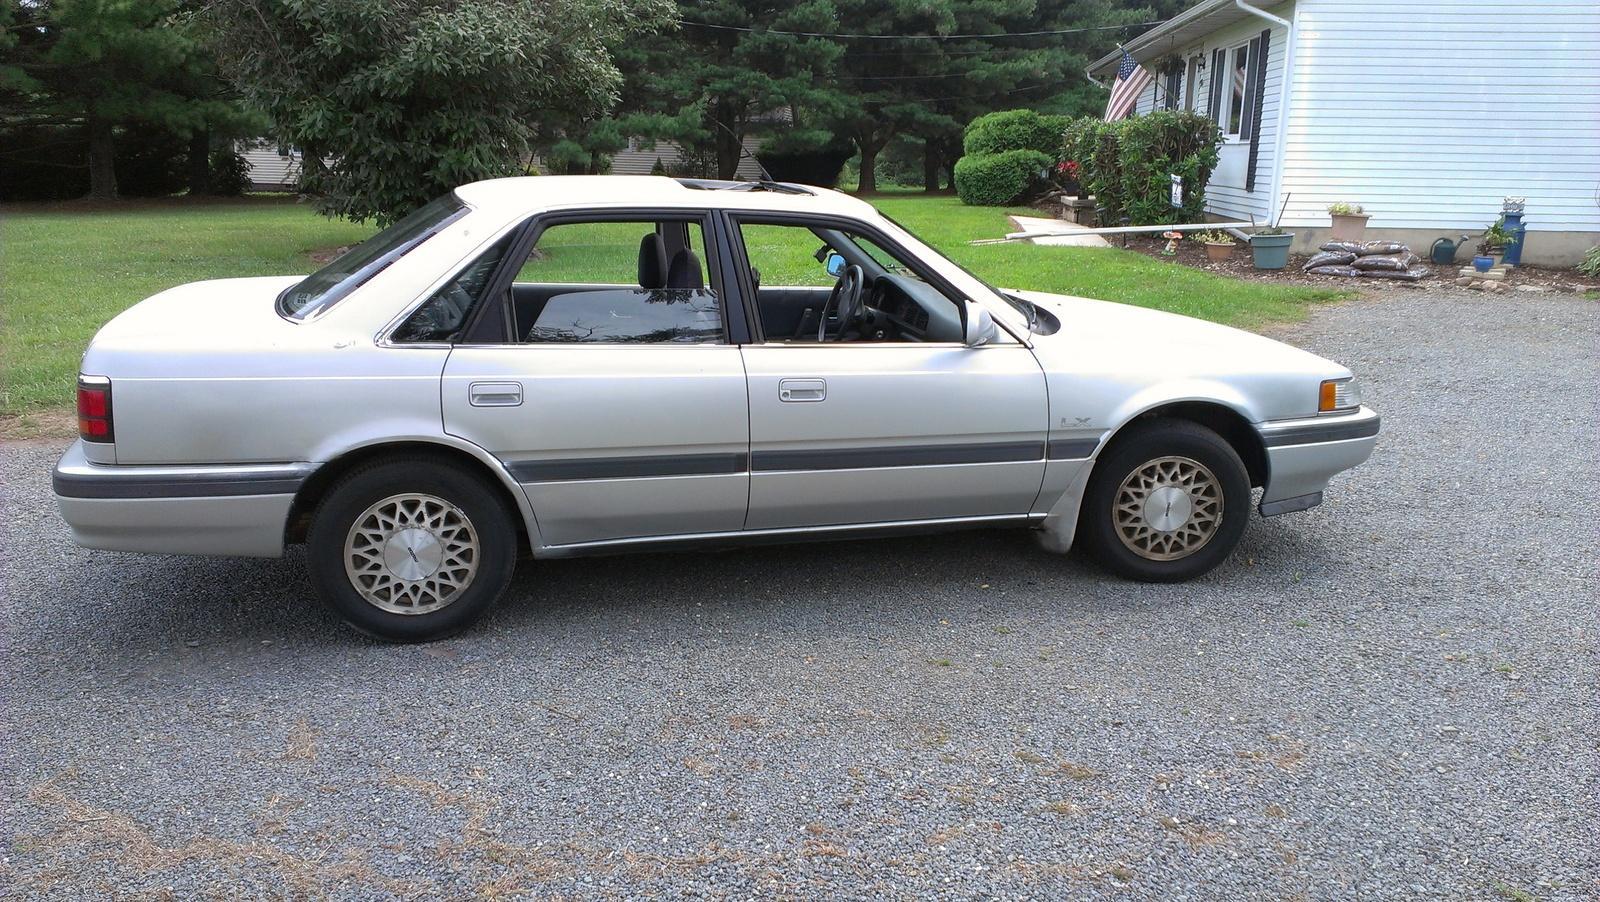 91 Mazda 626 Fuse Diagram Wiring Library 1988 Box 800 1024 1280 1600 Origin 1991